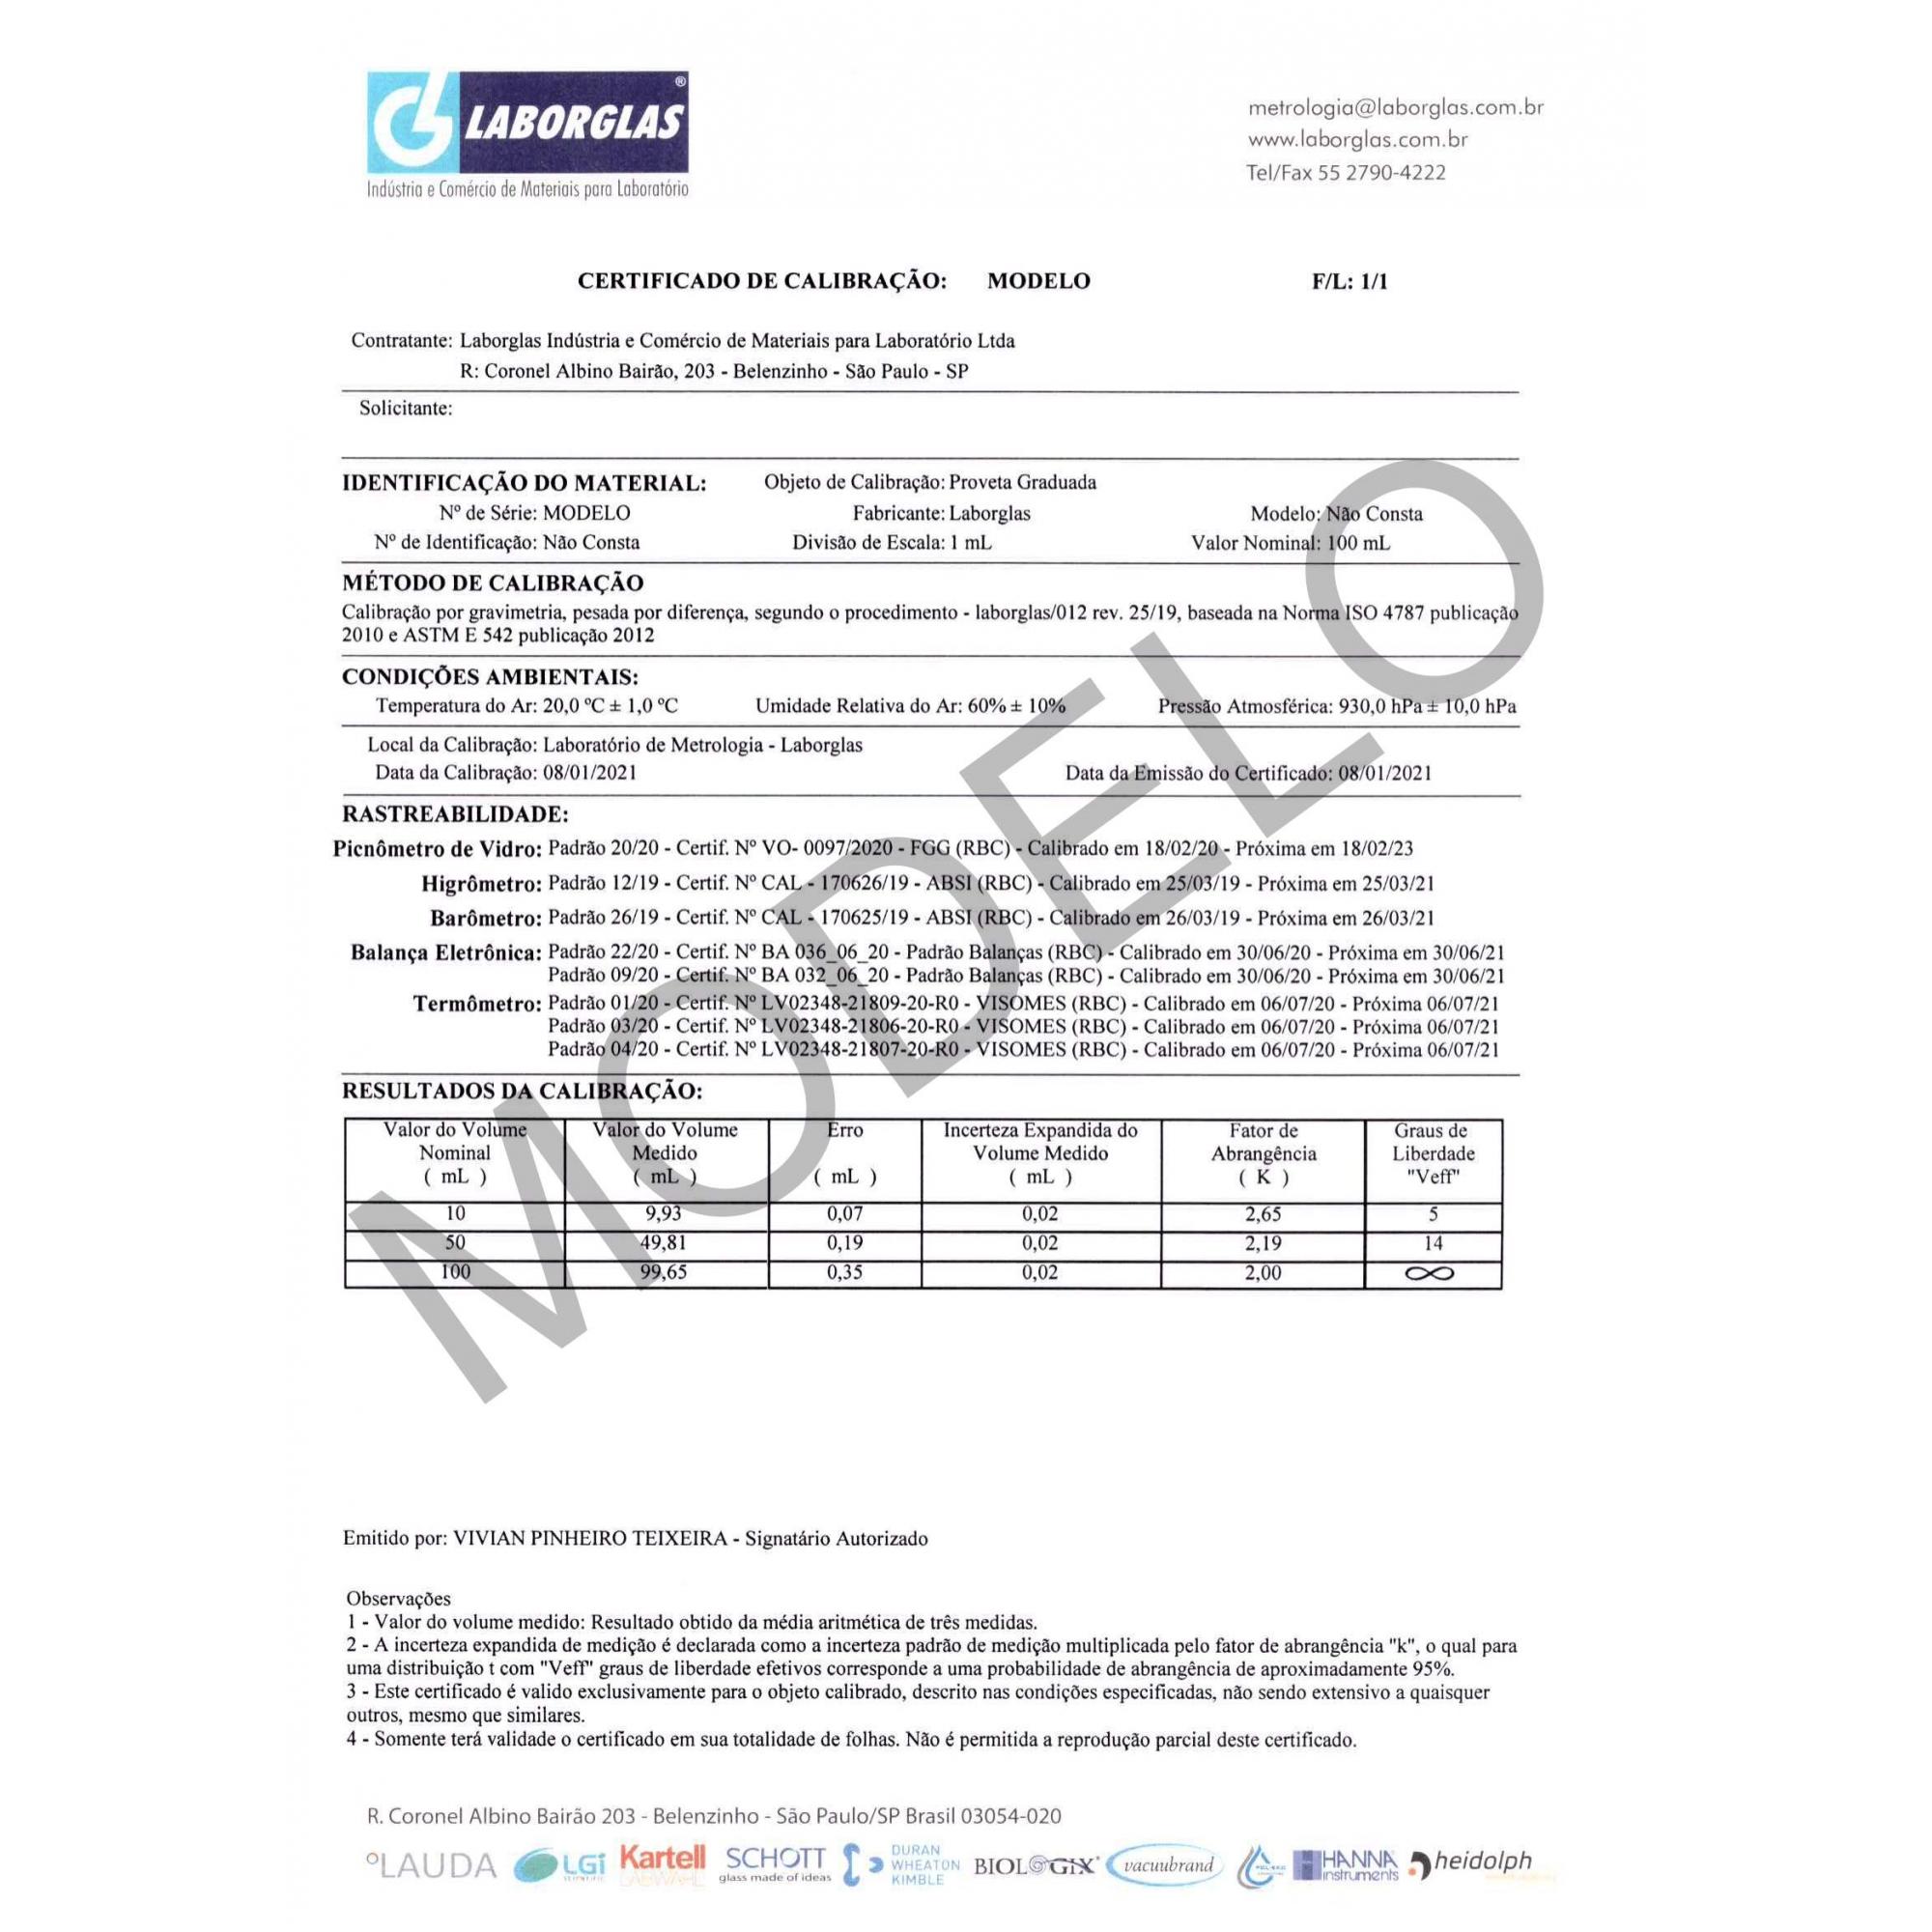 PROVETA GRADUADA BASE HEXAGONAL DE VIDRO 100 ML CLASSE A CERTIFICADO RASTREÁVEL - Laborglas - Cód. 9139724-C